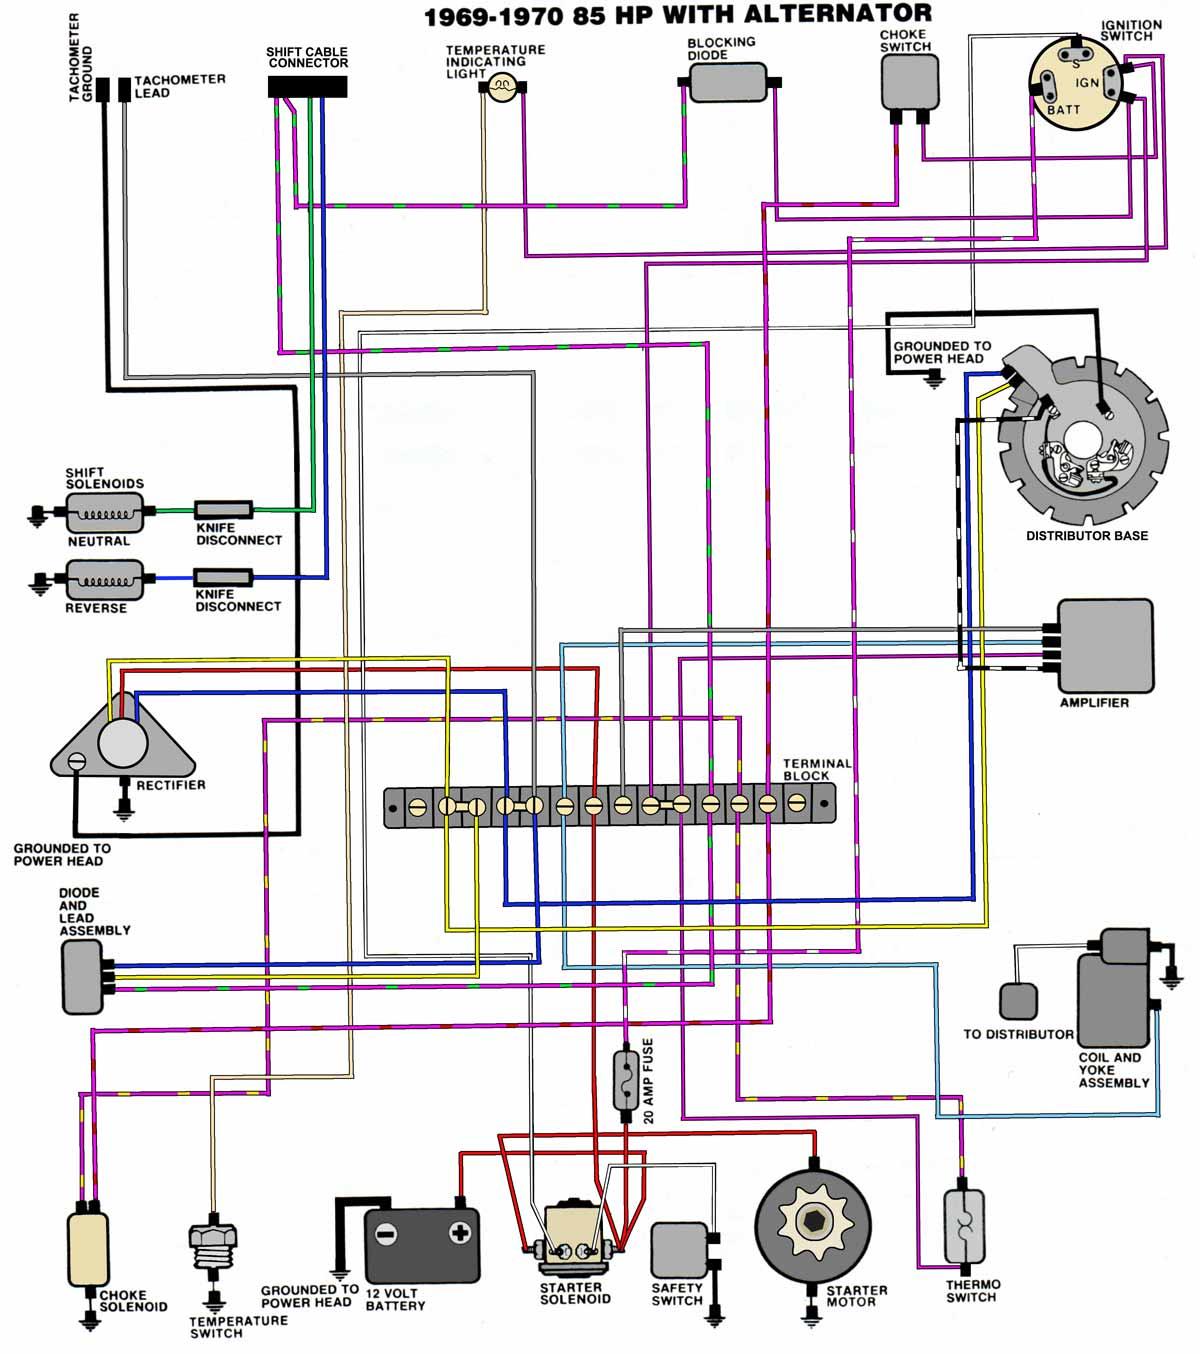 69_70_V4?resize\=665%2C750 1971 johnson control wiring diagram gandul 45 77 79 119 Metasys Ahu Controller at gsmx.co